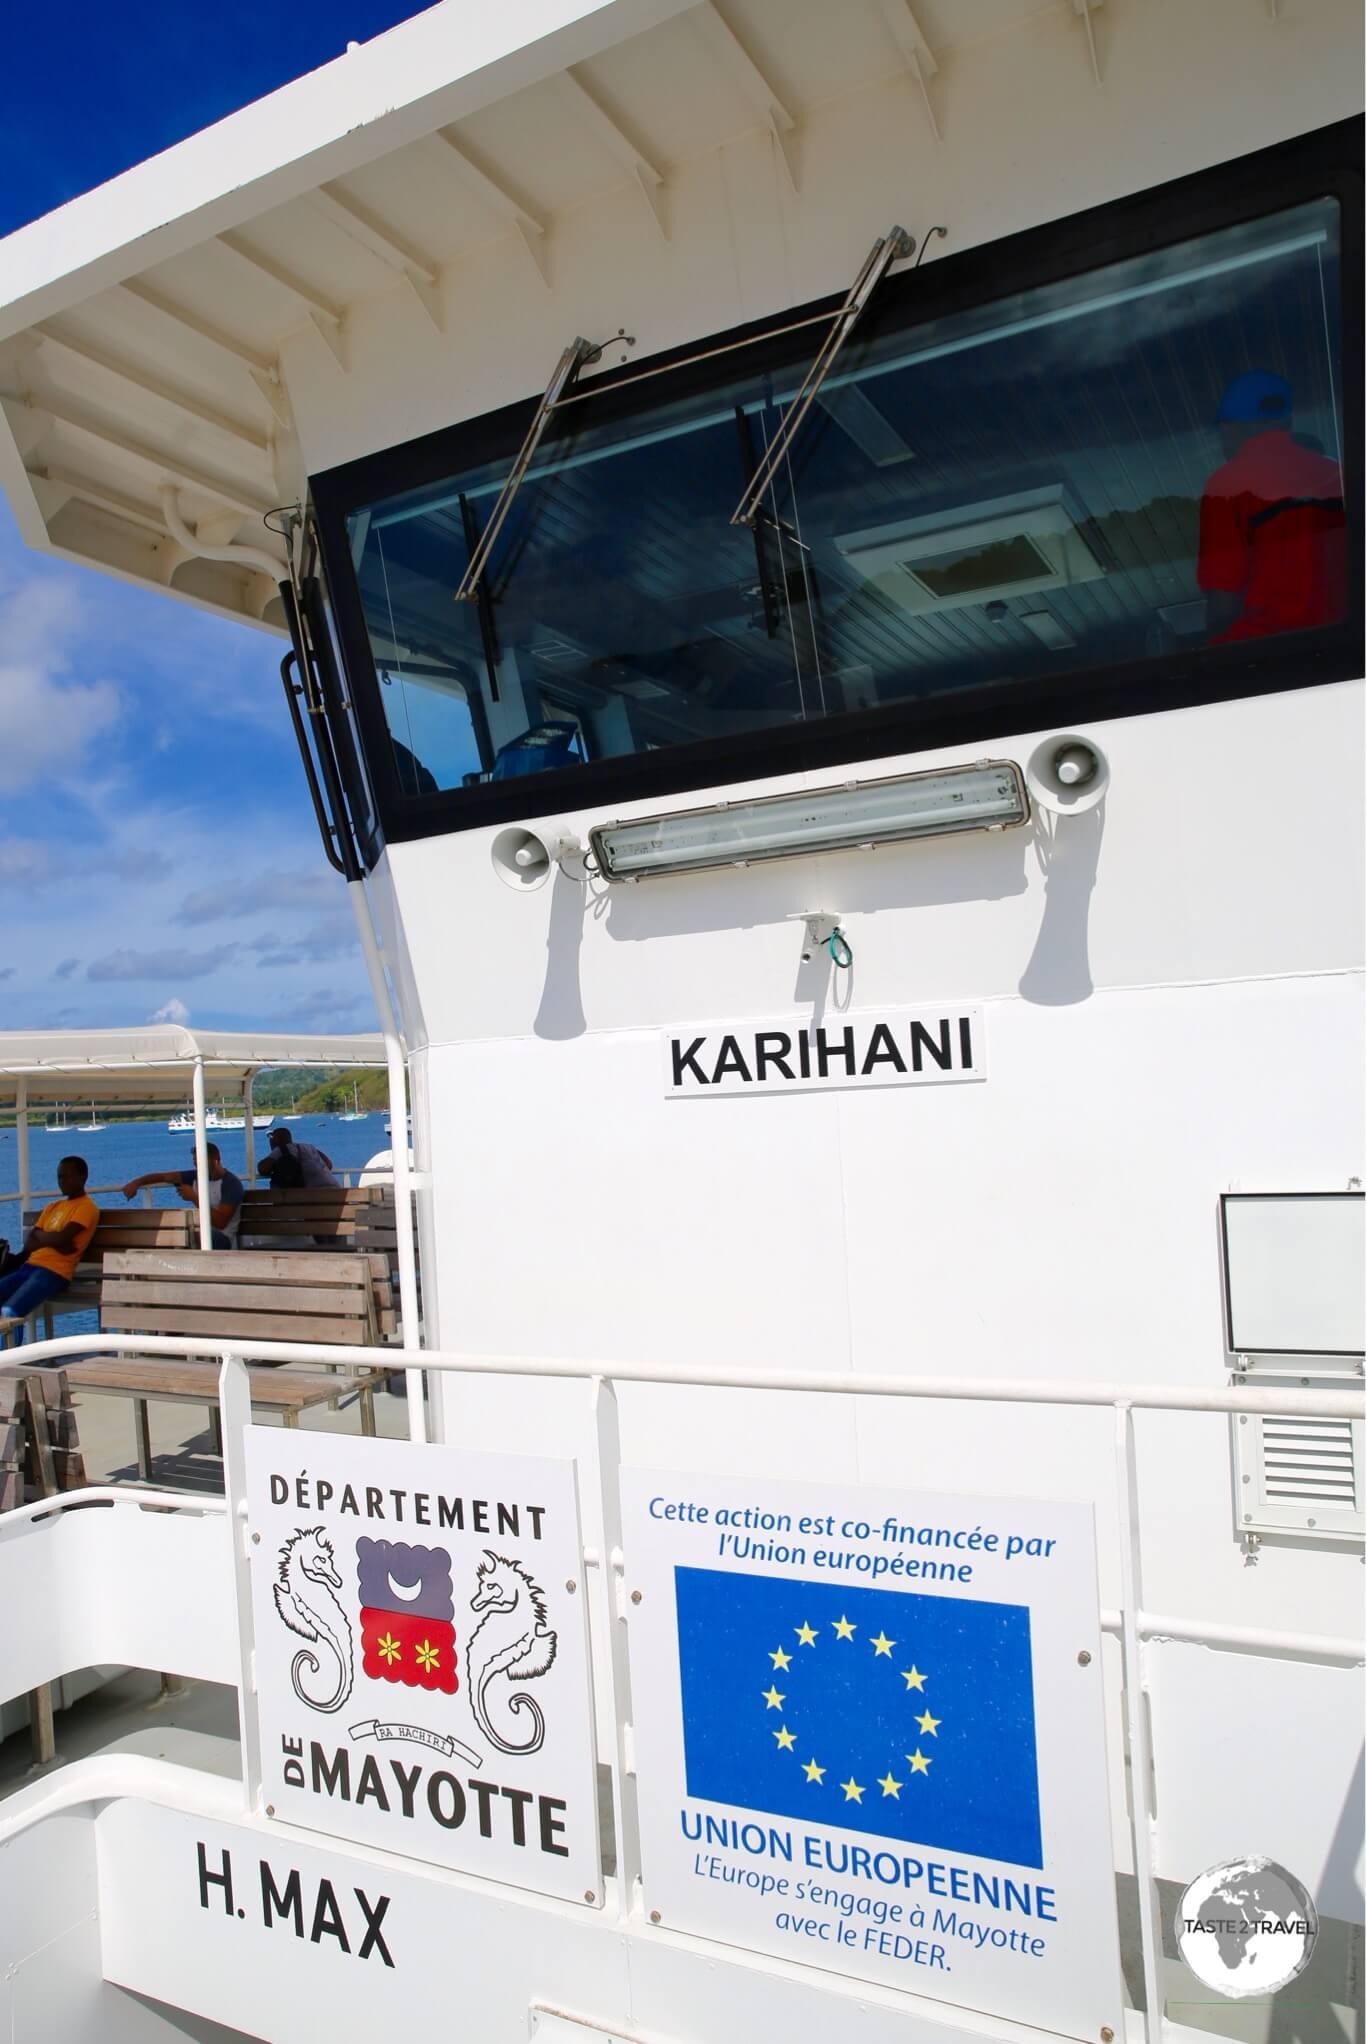 On board the Karihani barge.